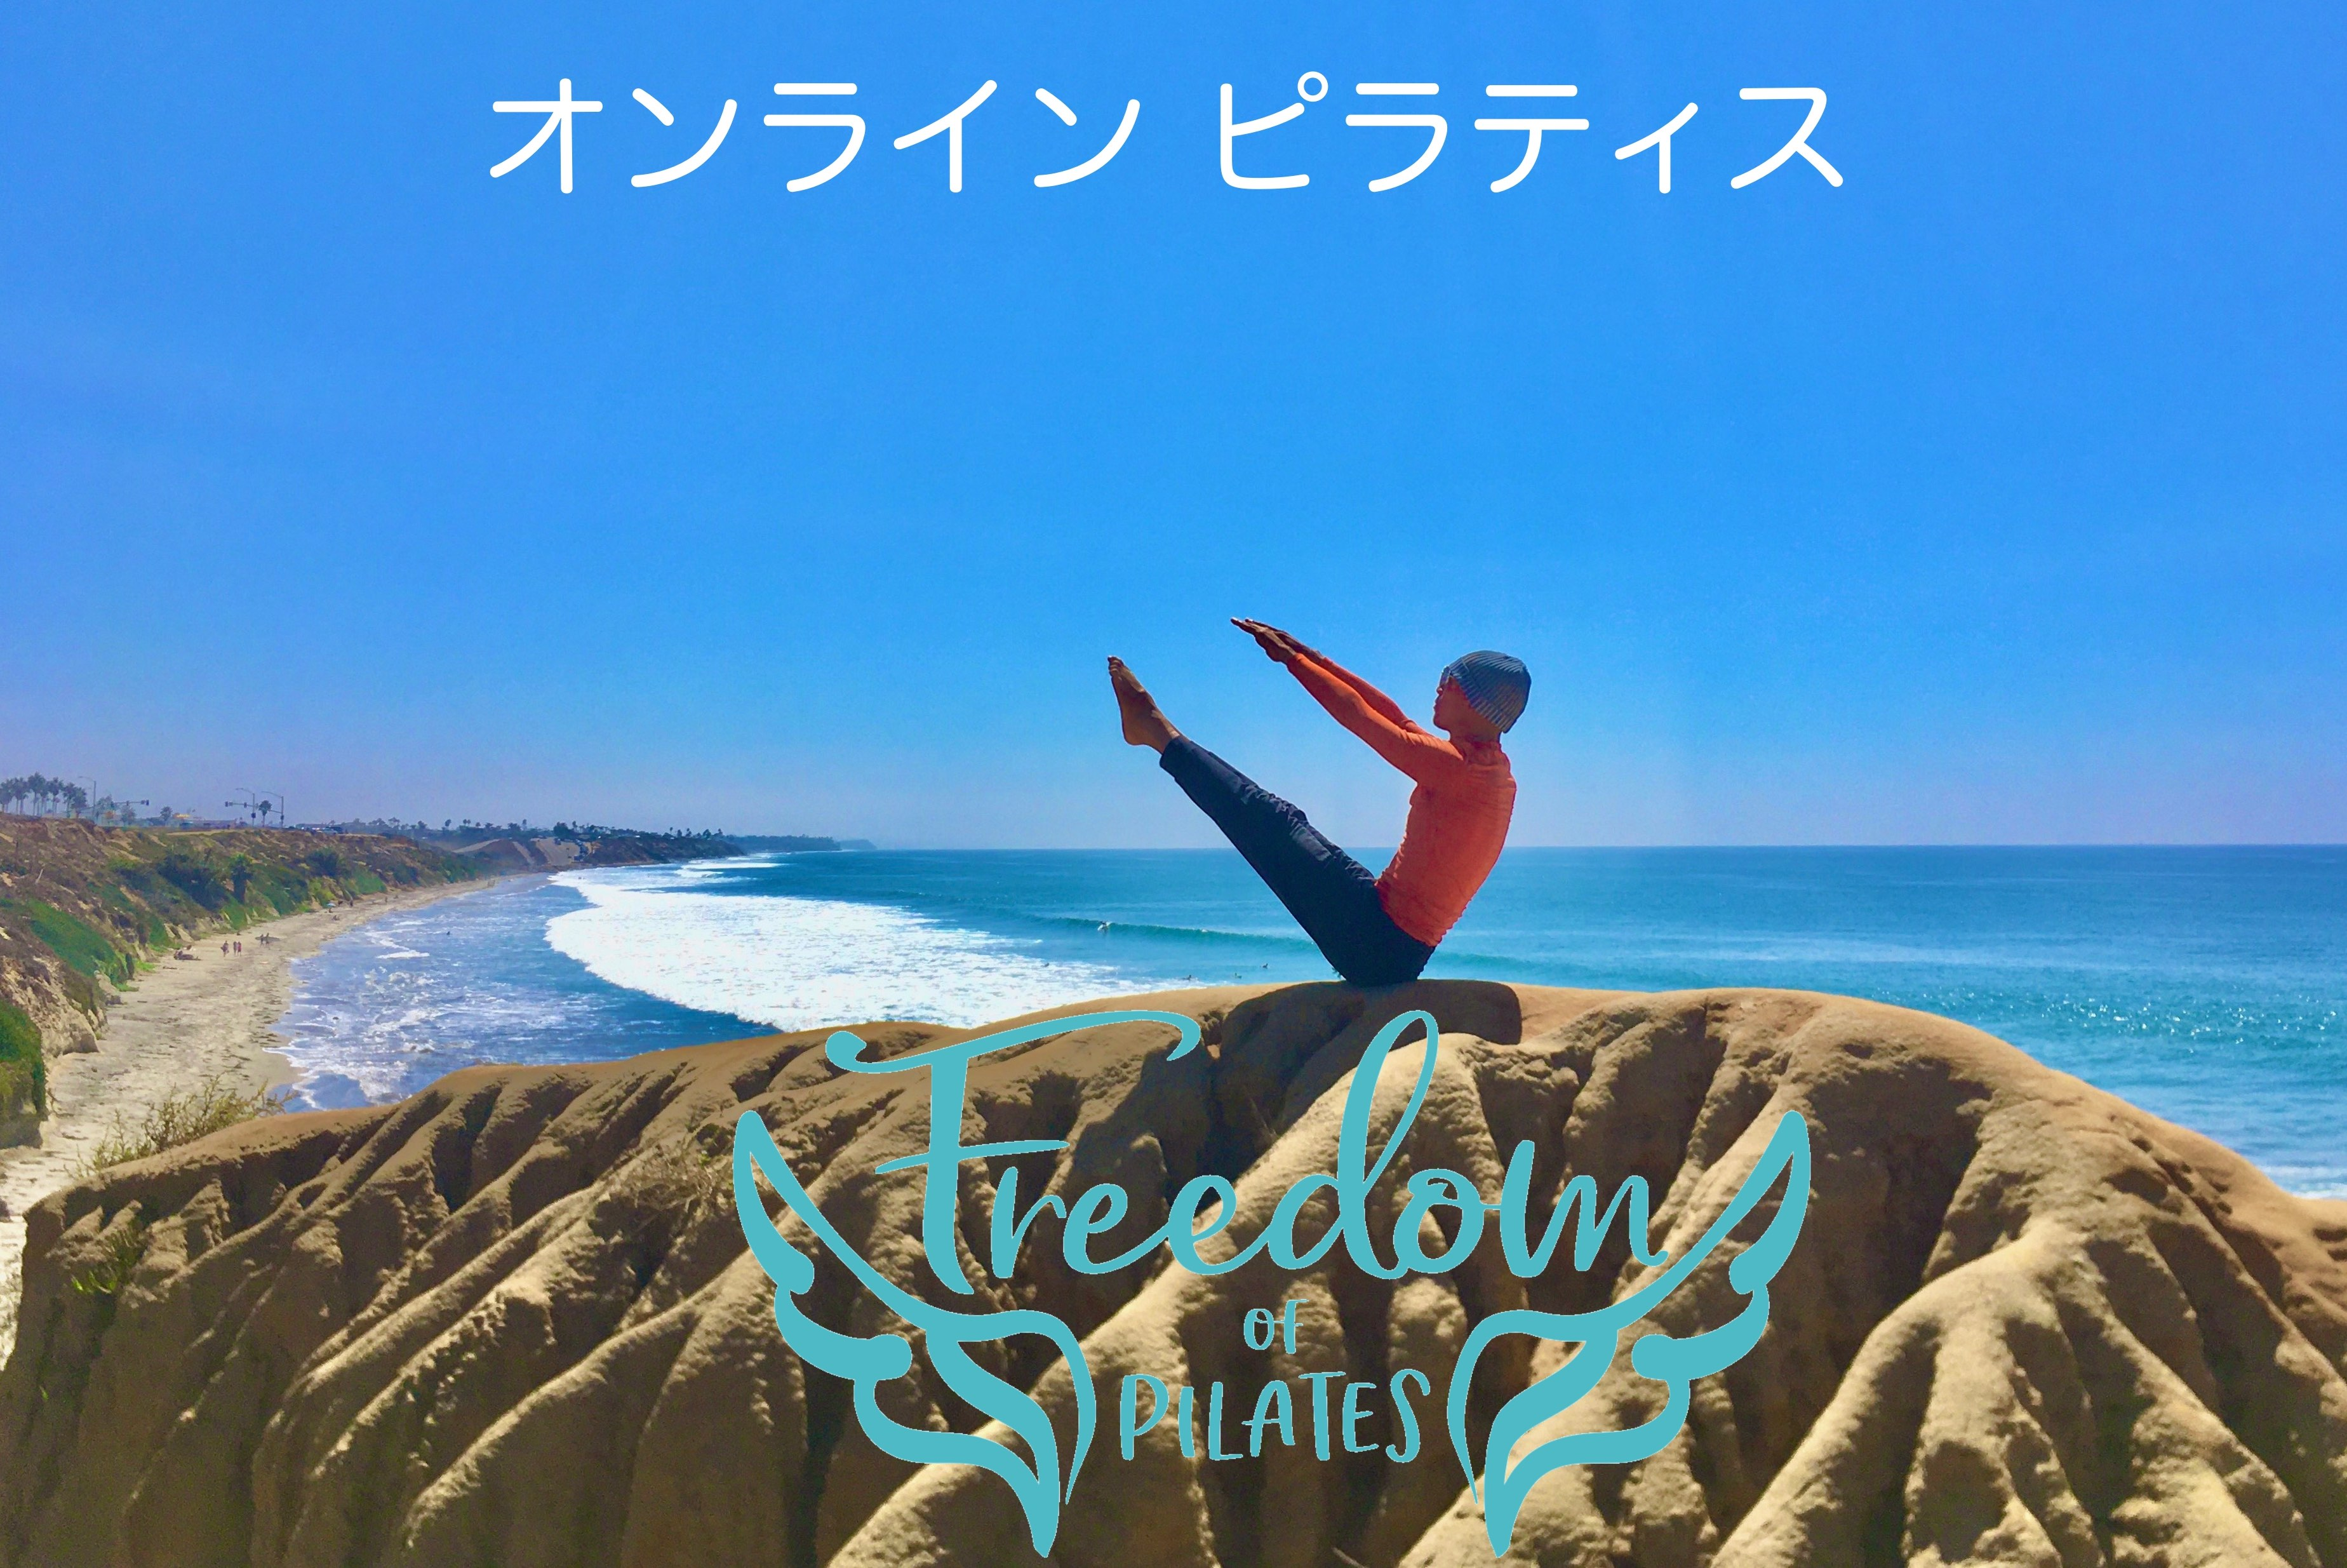 FreedomofPilates